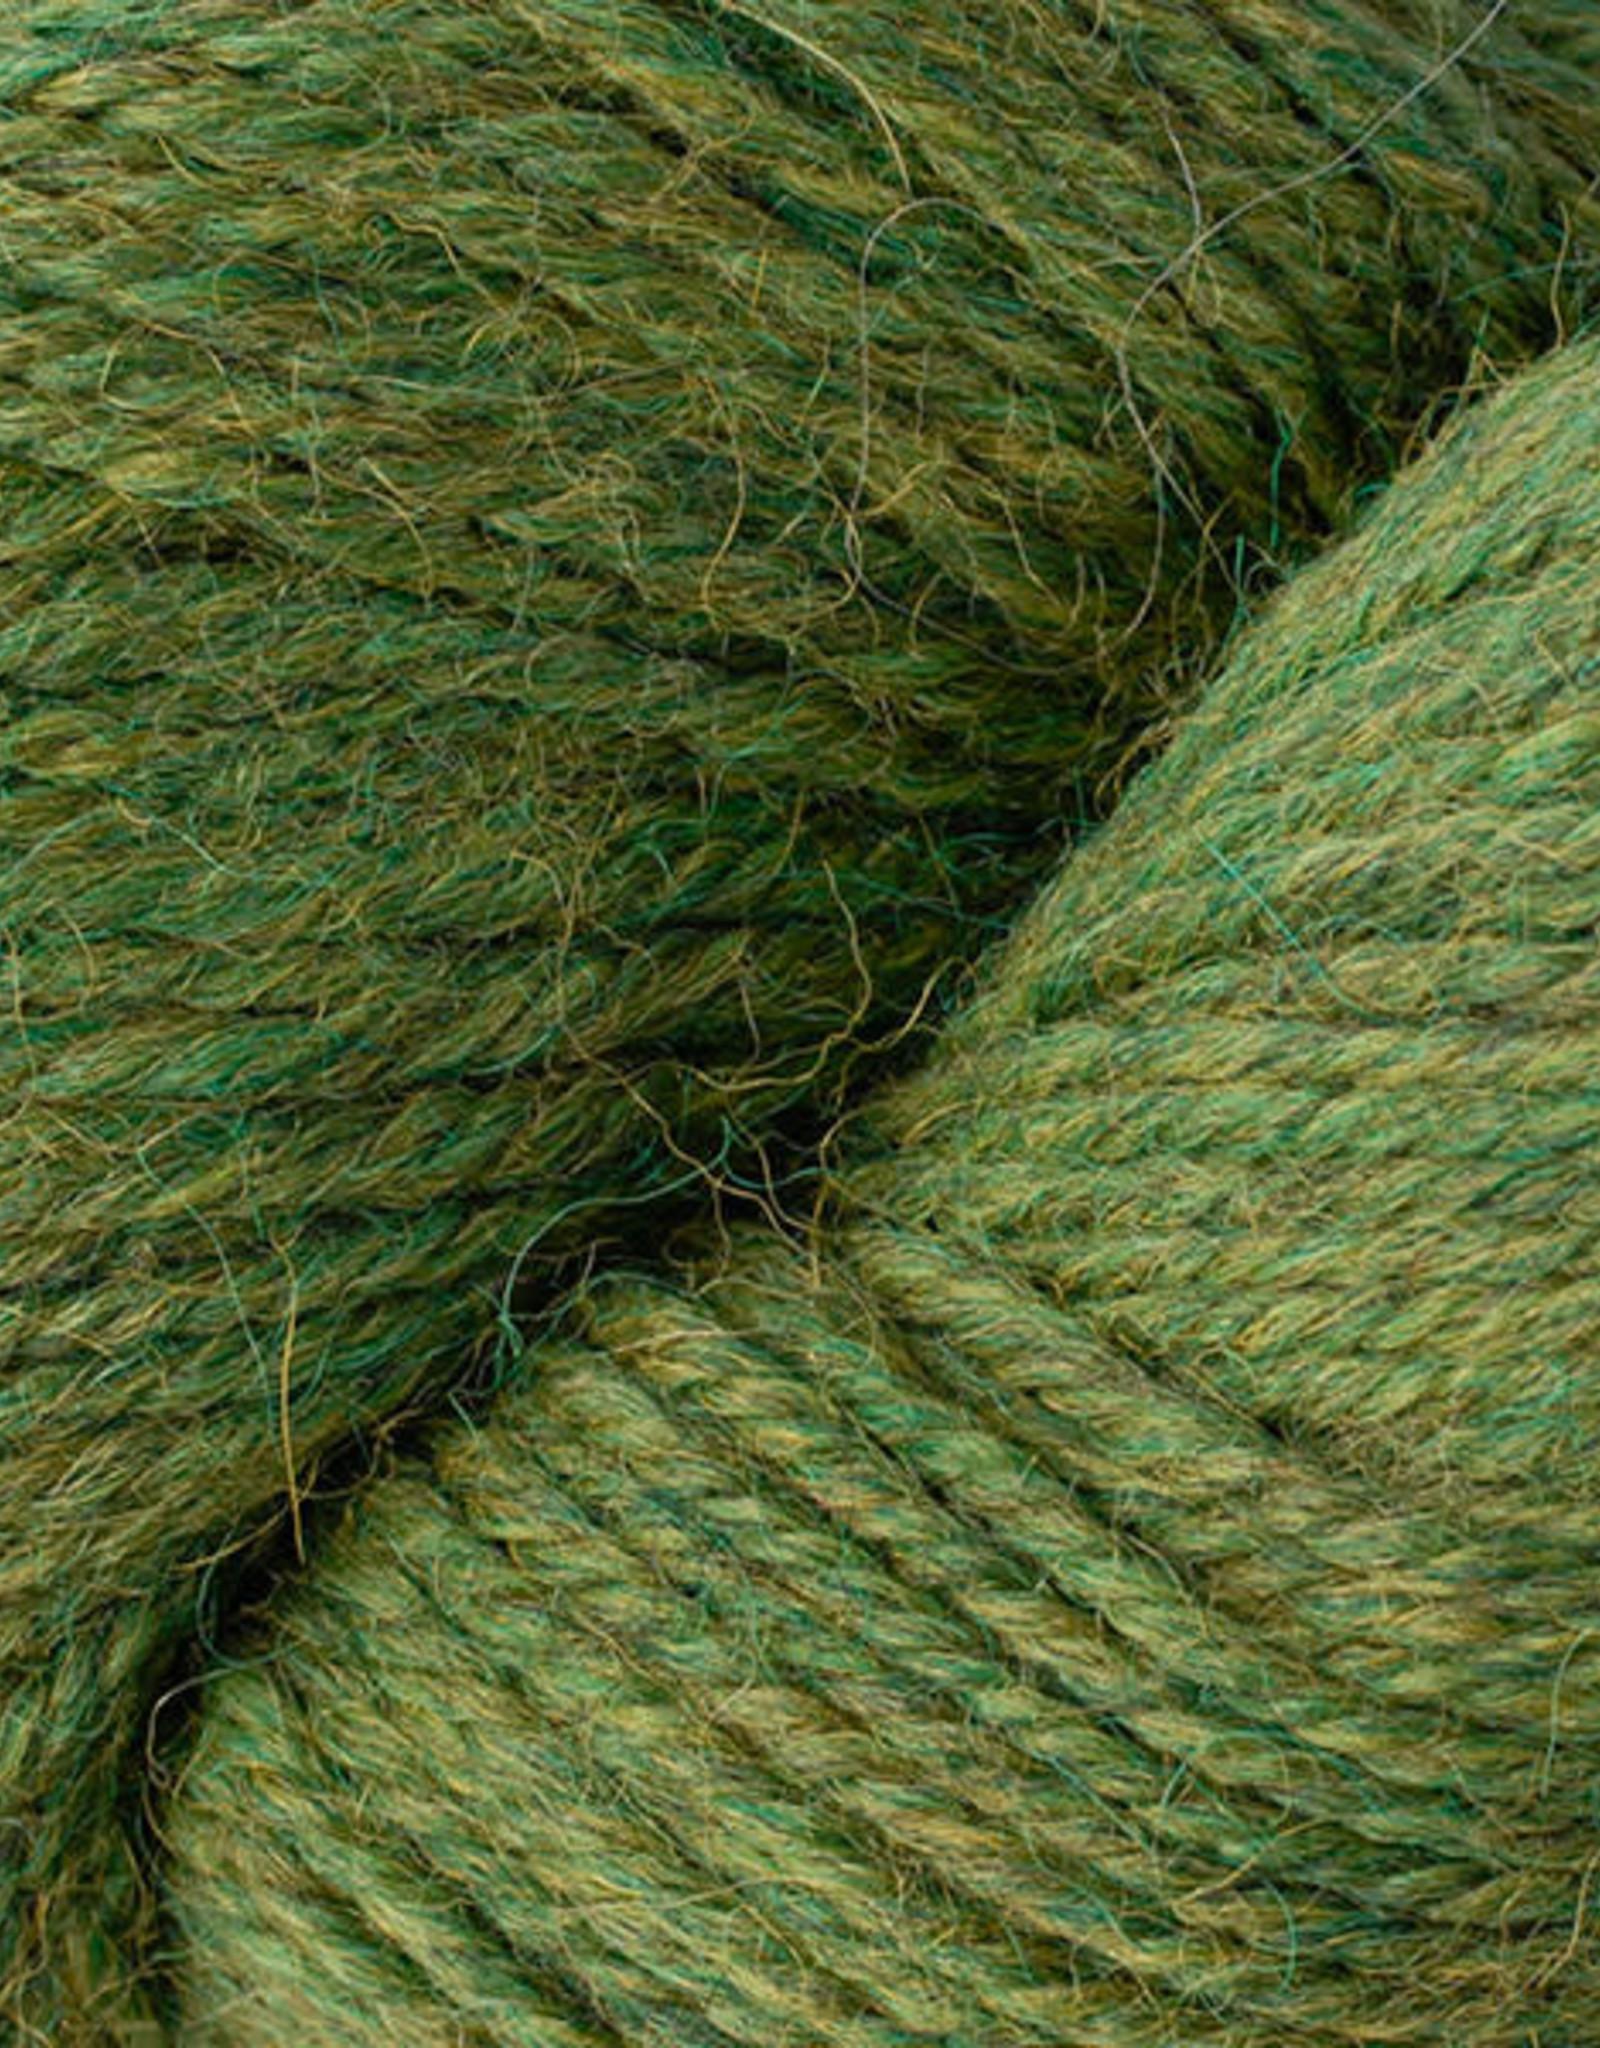 Berroco Ultra Alpaca Worst 6273 irwyn green mix